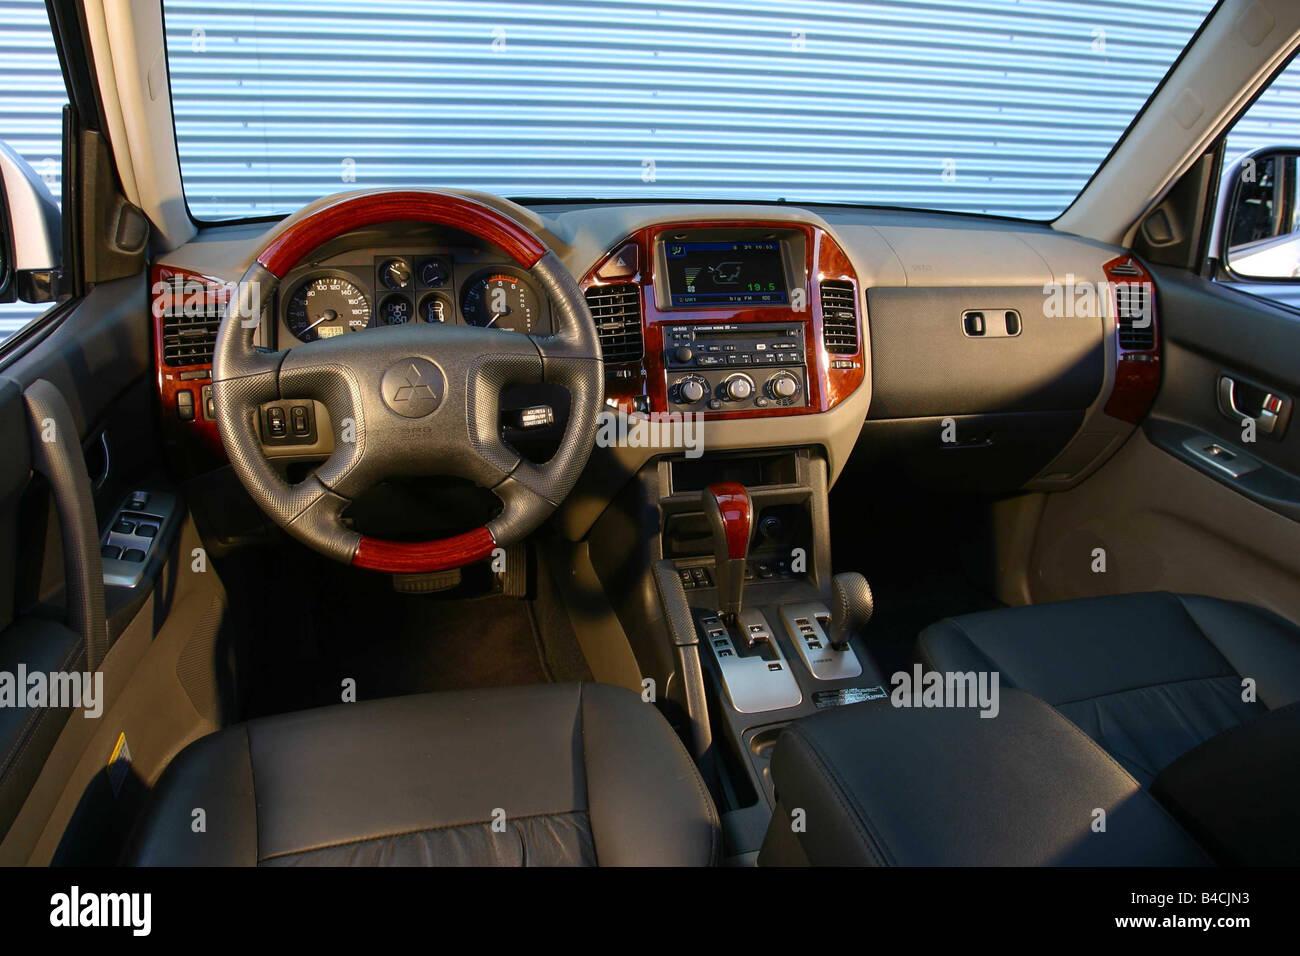 Auto, Mitsubishi Pajero, Langlauf Fahrzeug Modelljahr 2000-Silber ...